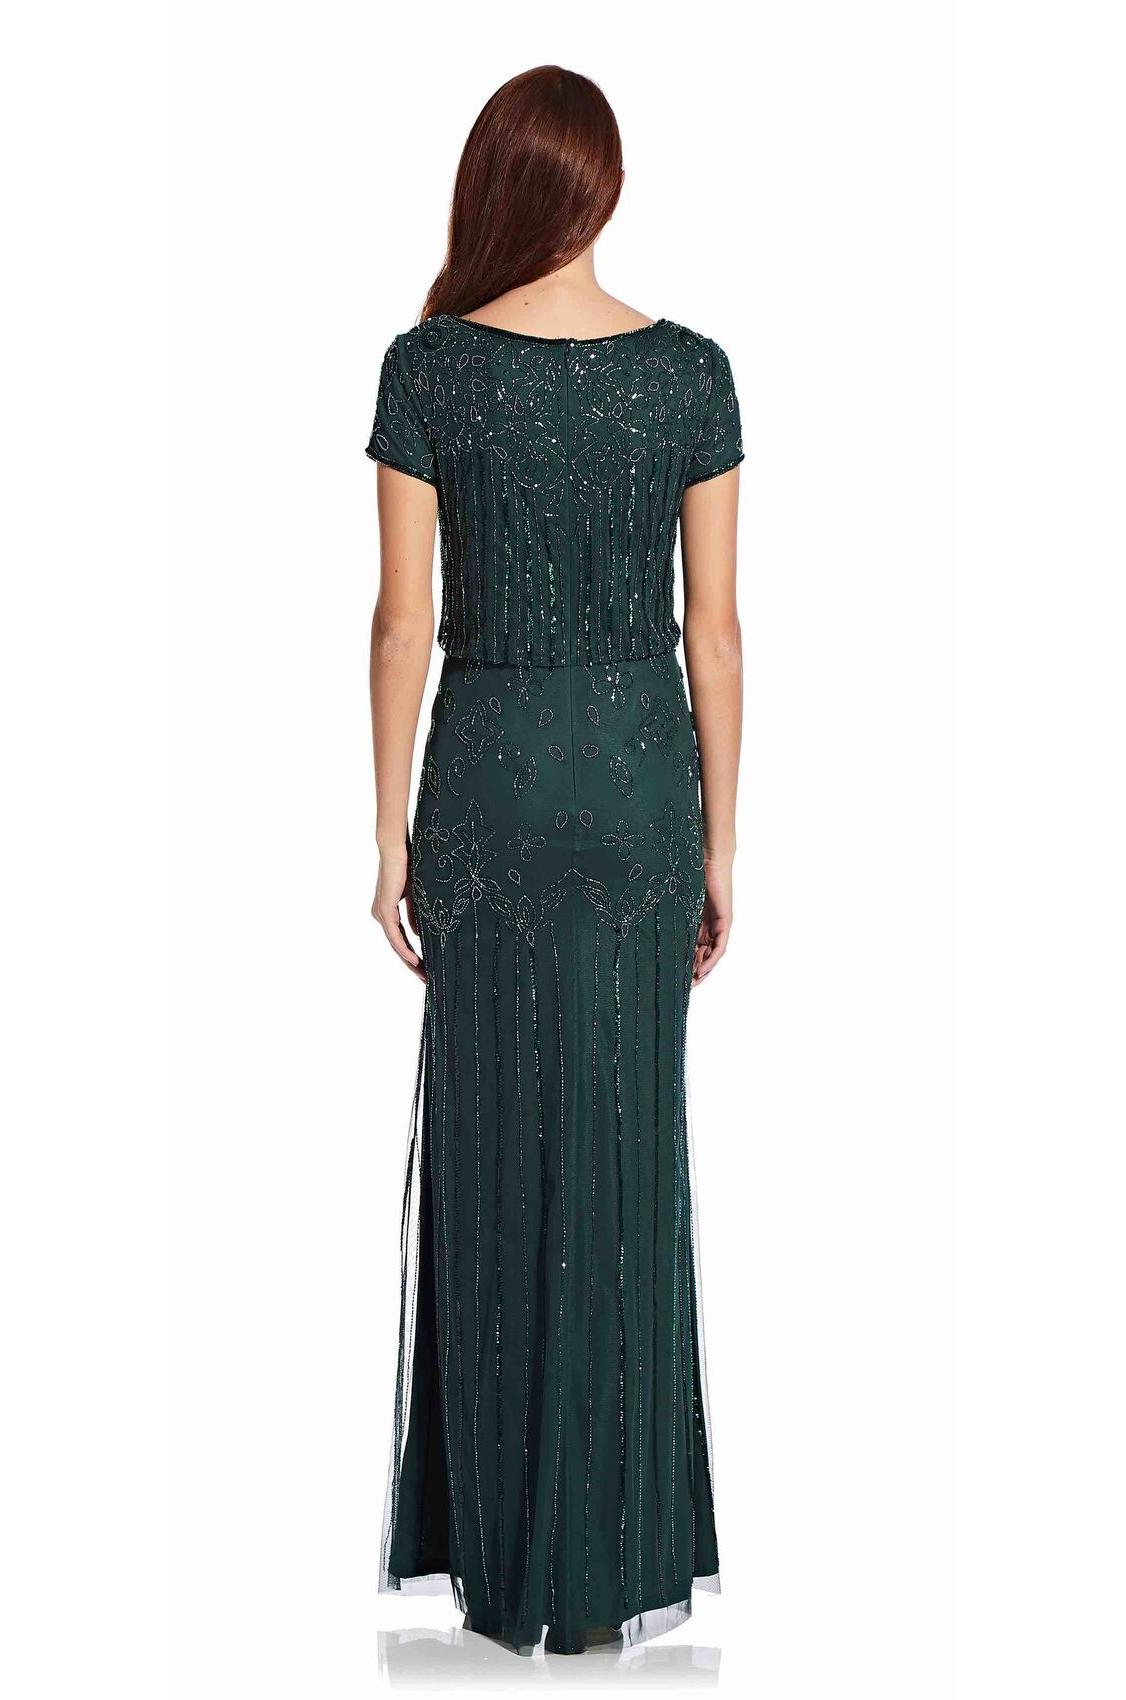 Nina Short Sleeve Blouson Beaded Gown By Adrianna Papell - Emerald